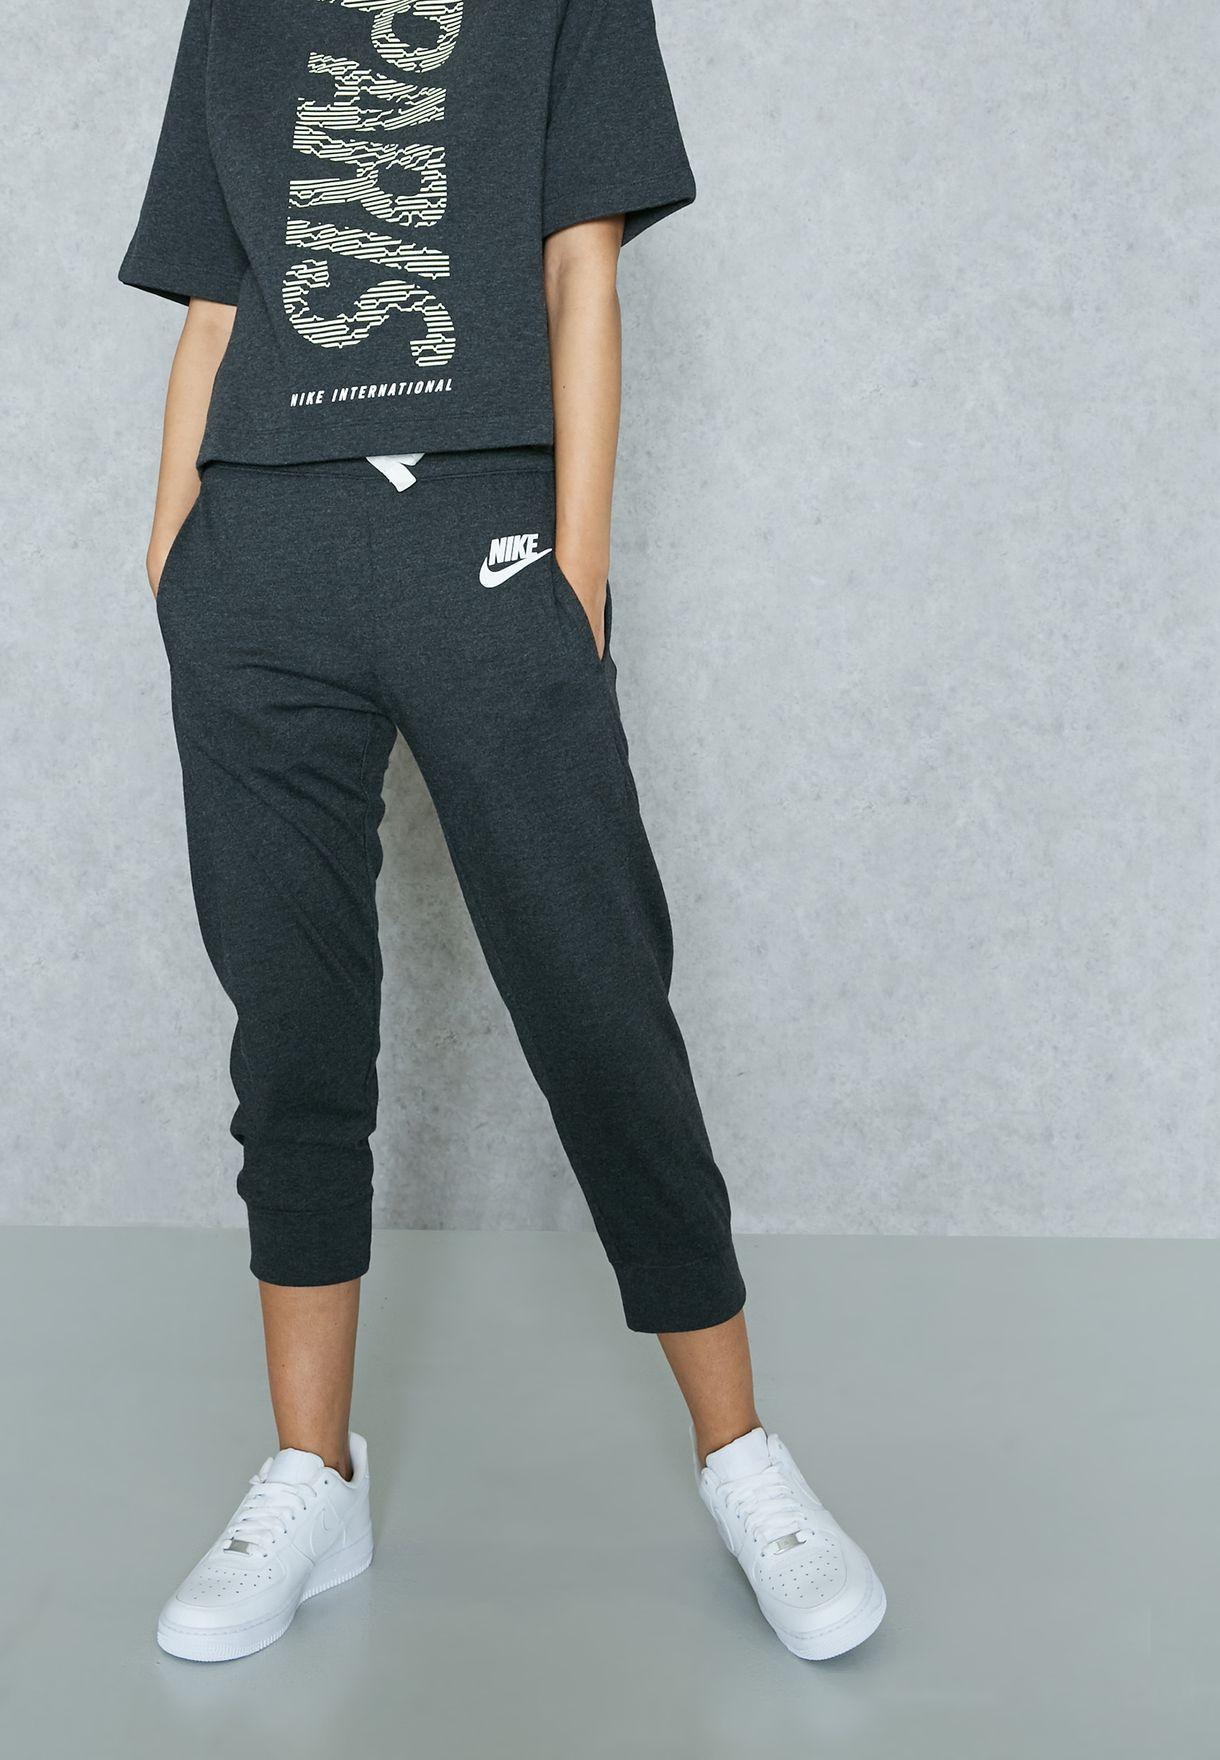 online store 4c61f 74fa5 Nike Sweatshirt And Sweatpants Set